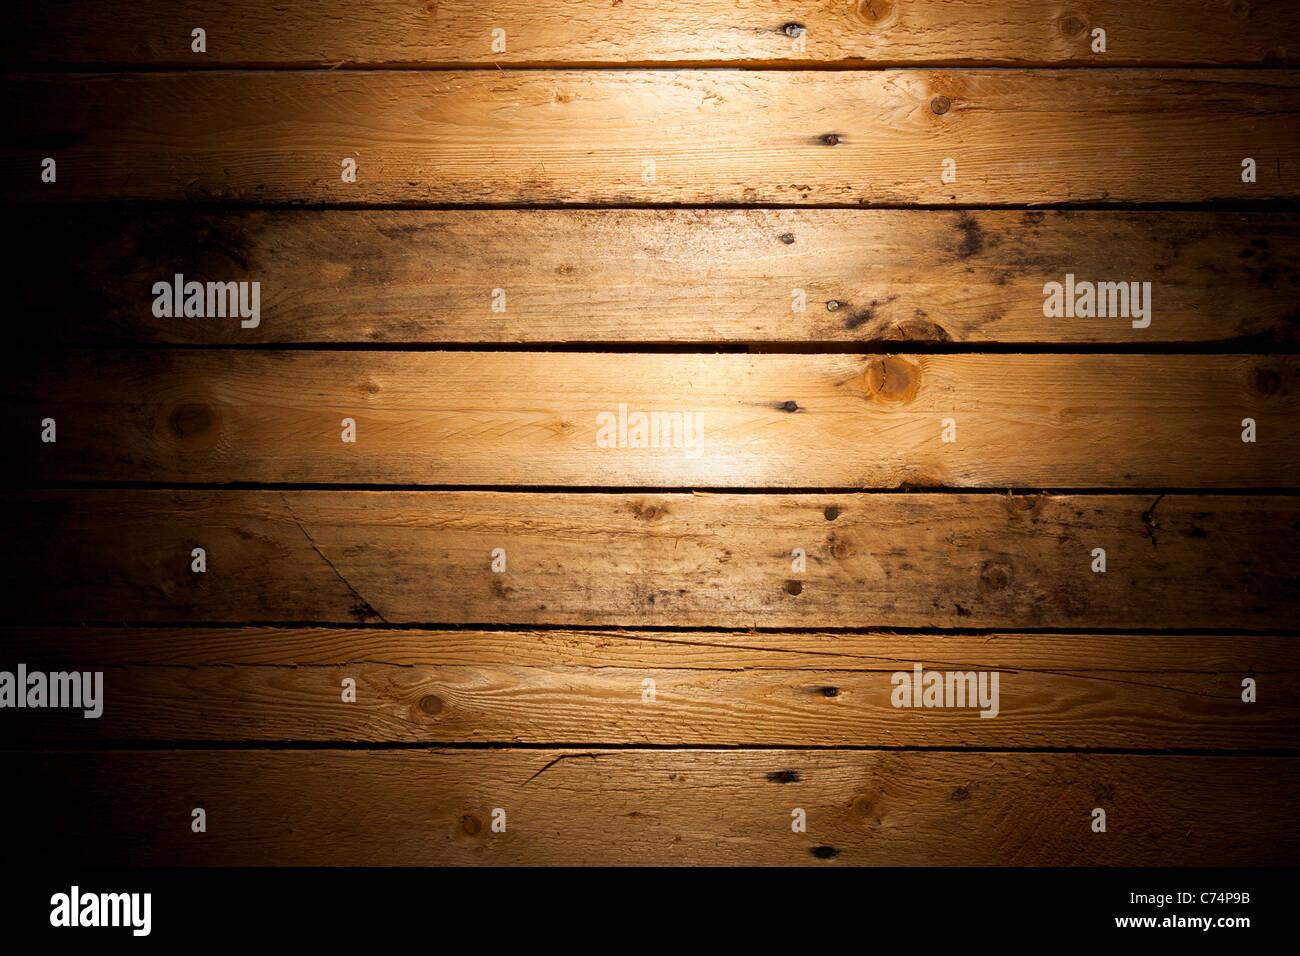 La madera de pino (Deal) Textura con Vignette Imagen De Stock